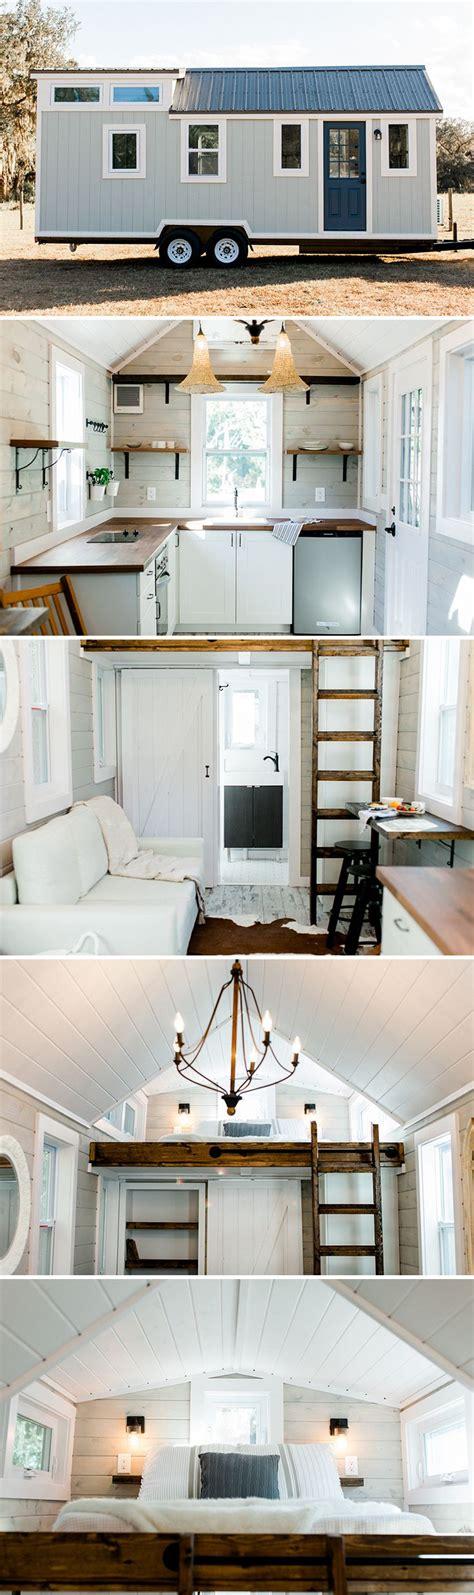 interior small house best 25 tiny house trailer ideas on pinterest micro